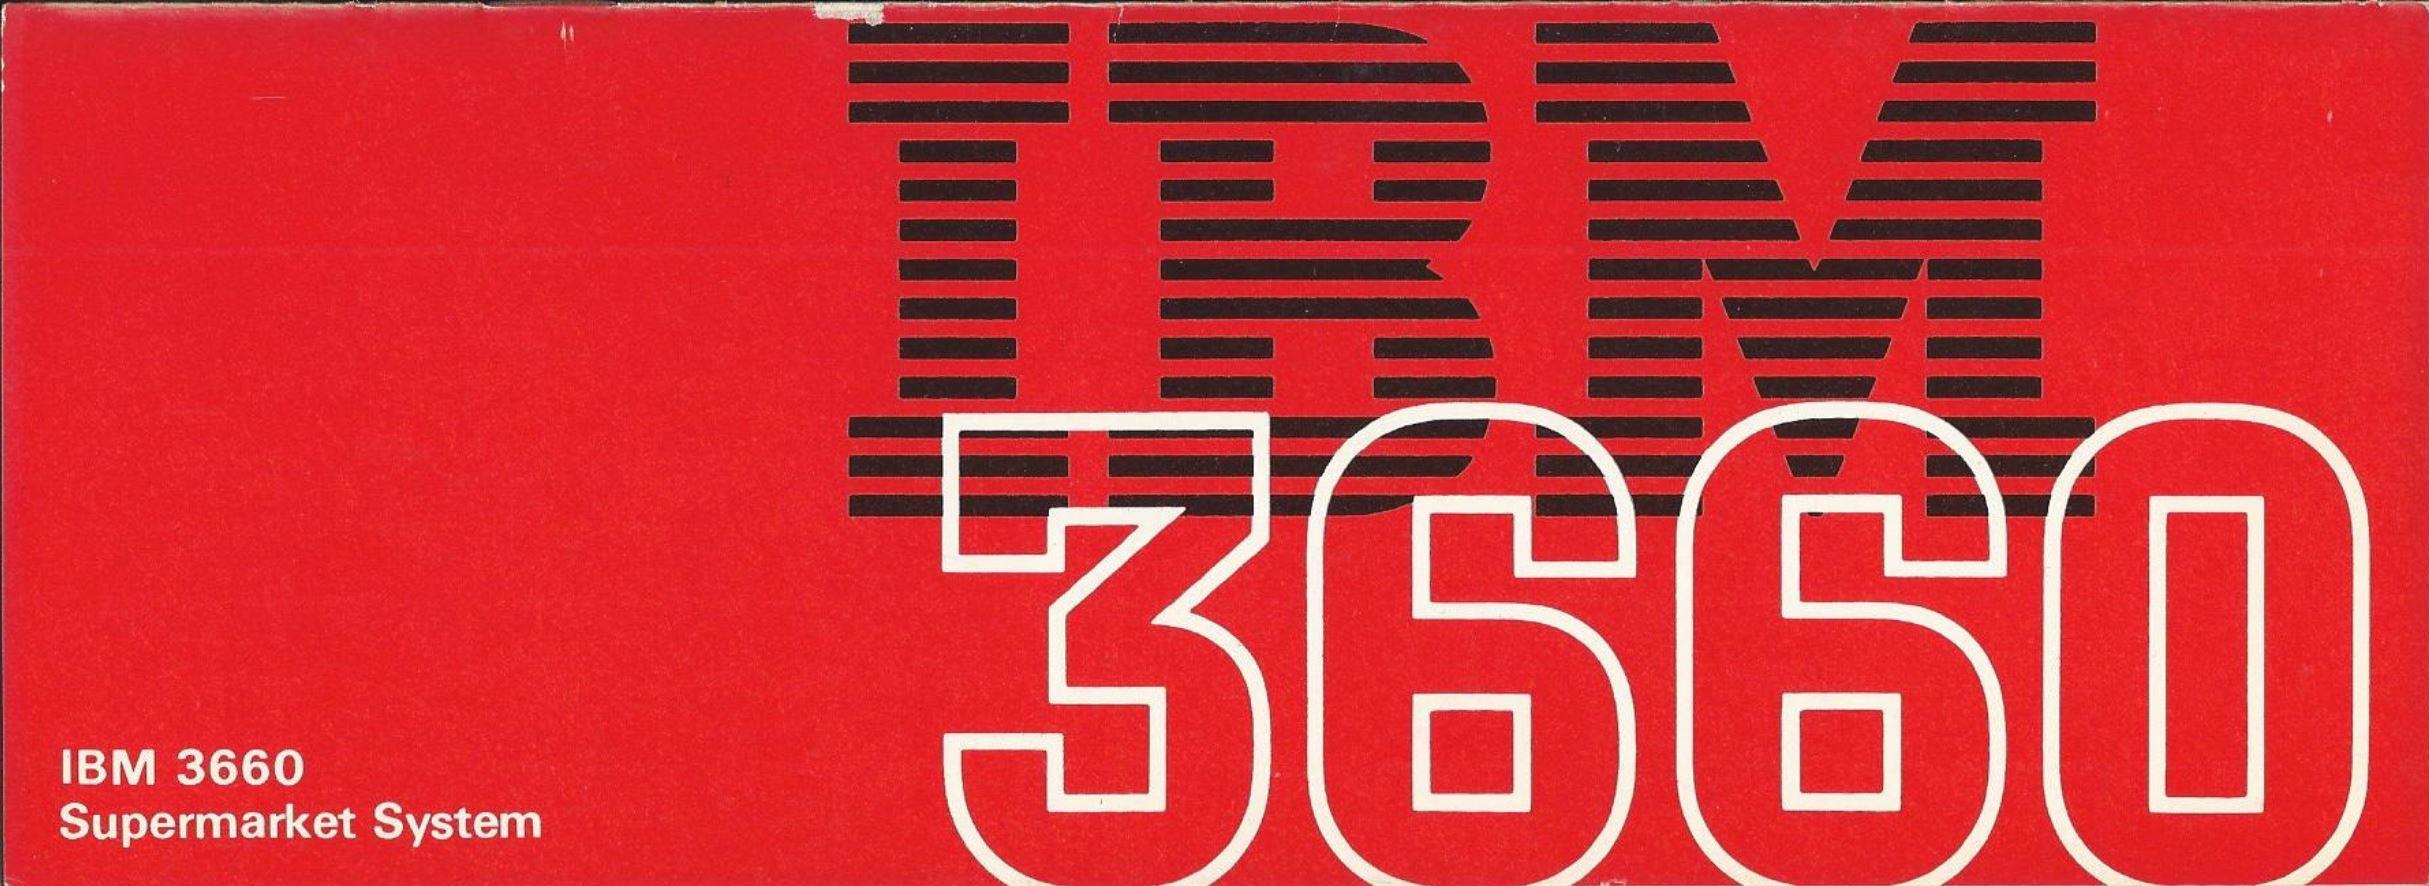 IBM 3660